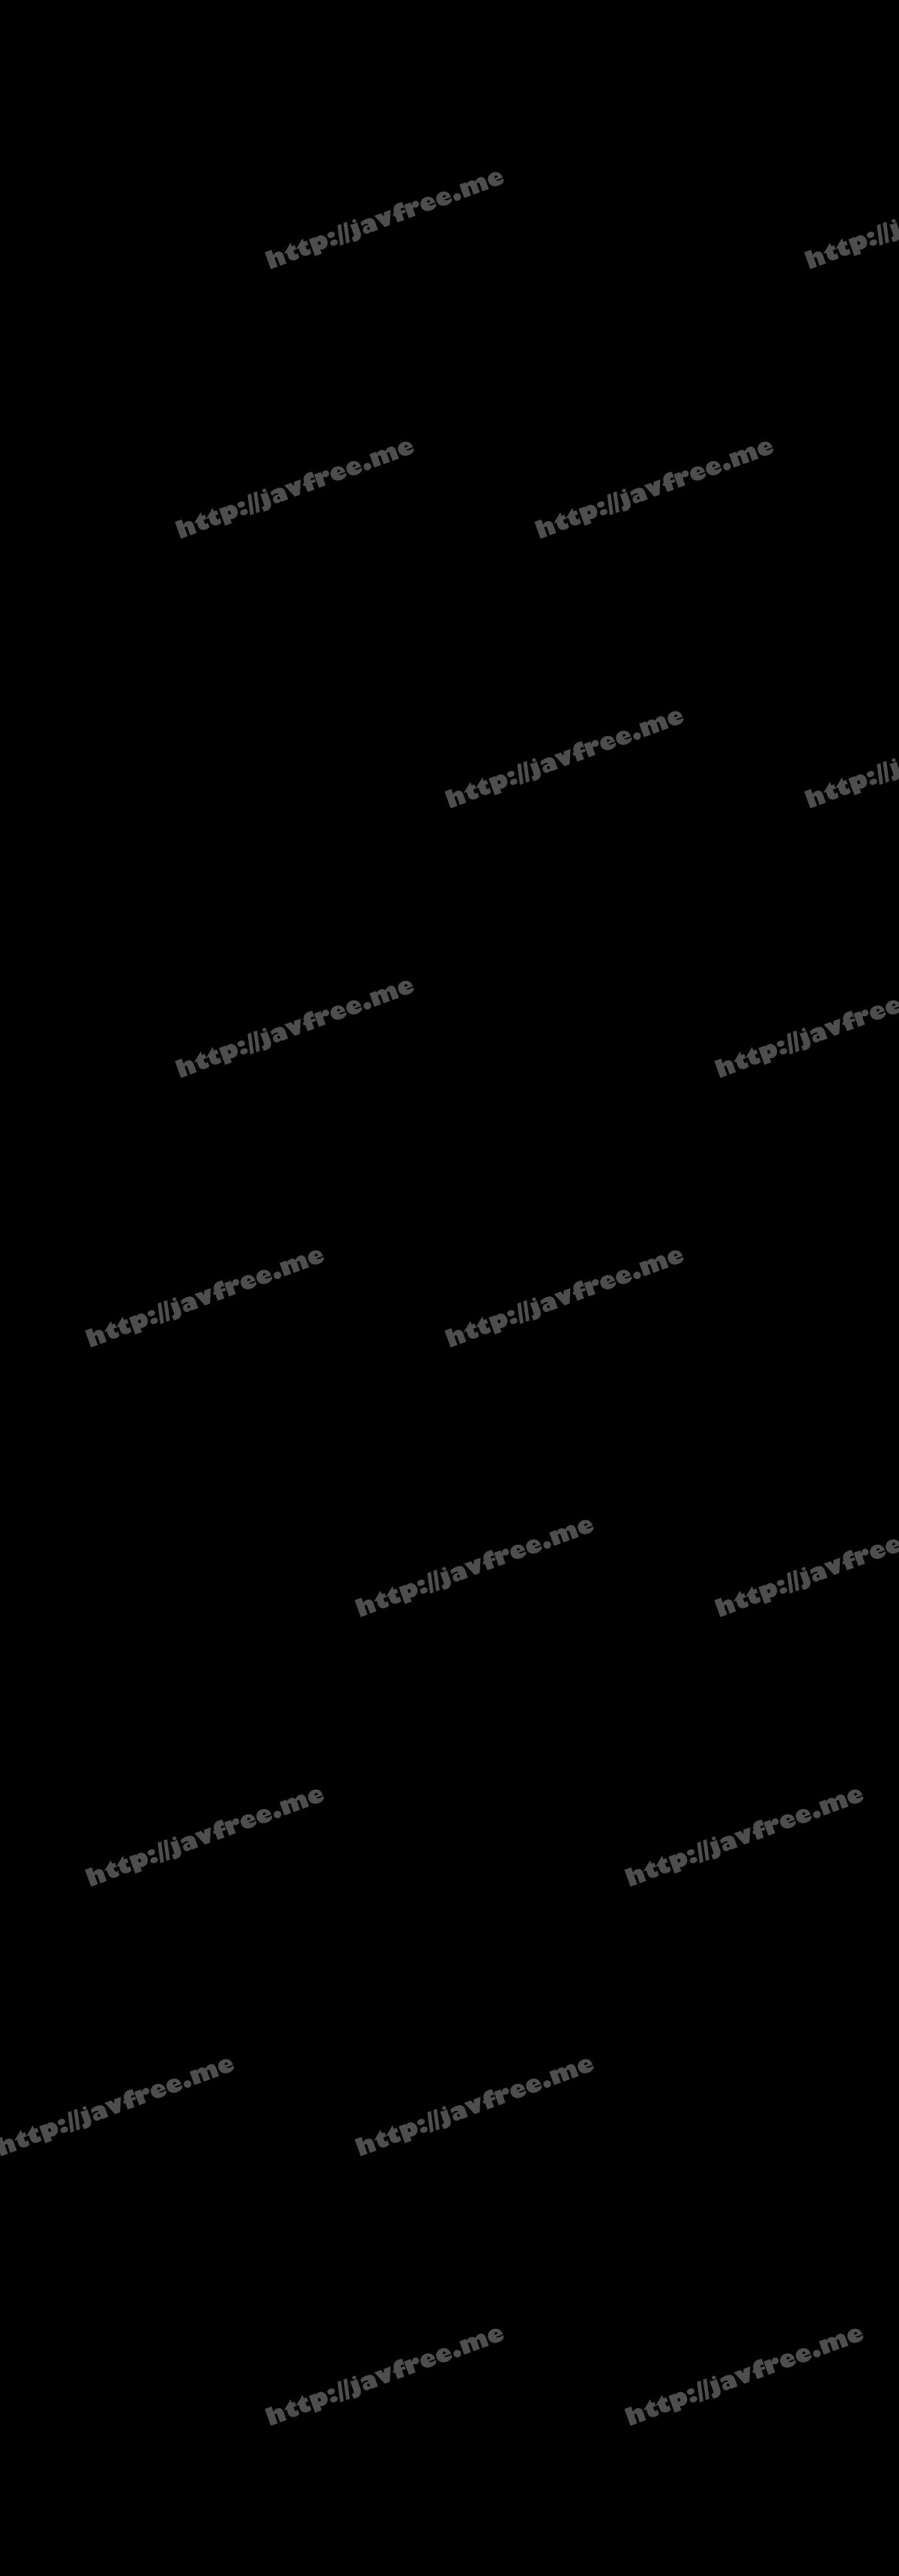 [HD][KRI-088] 泥酔オンナ狩り!! vol.04 - image KRI-088-1080p on https://javfree.me